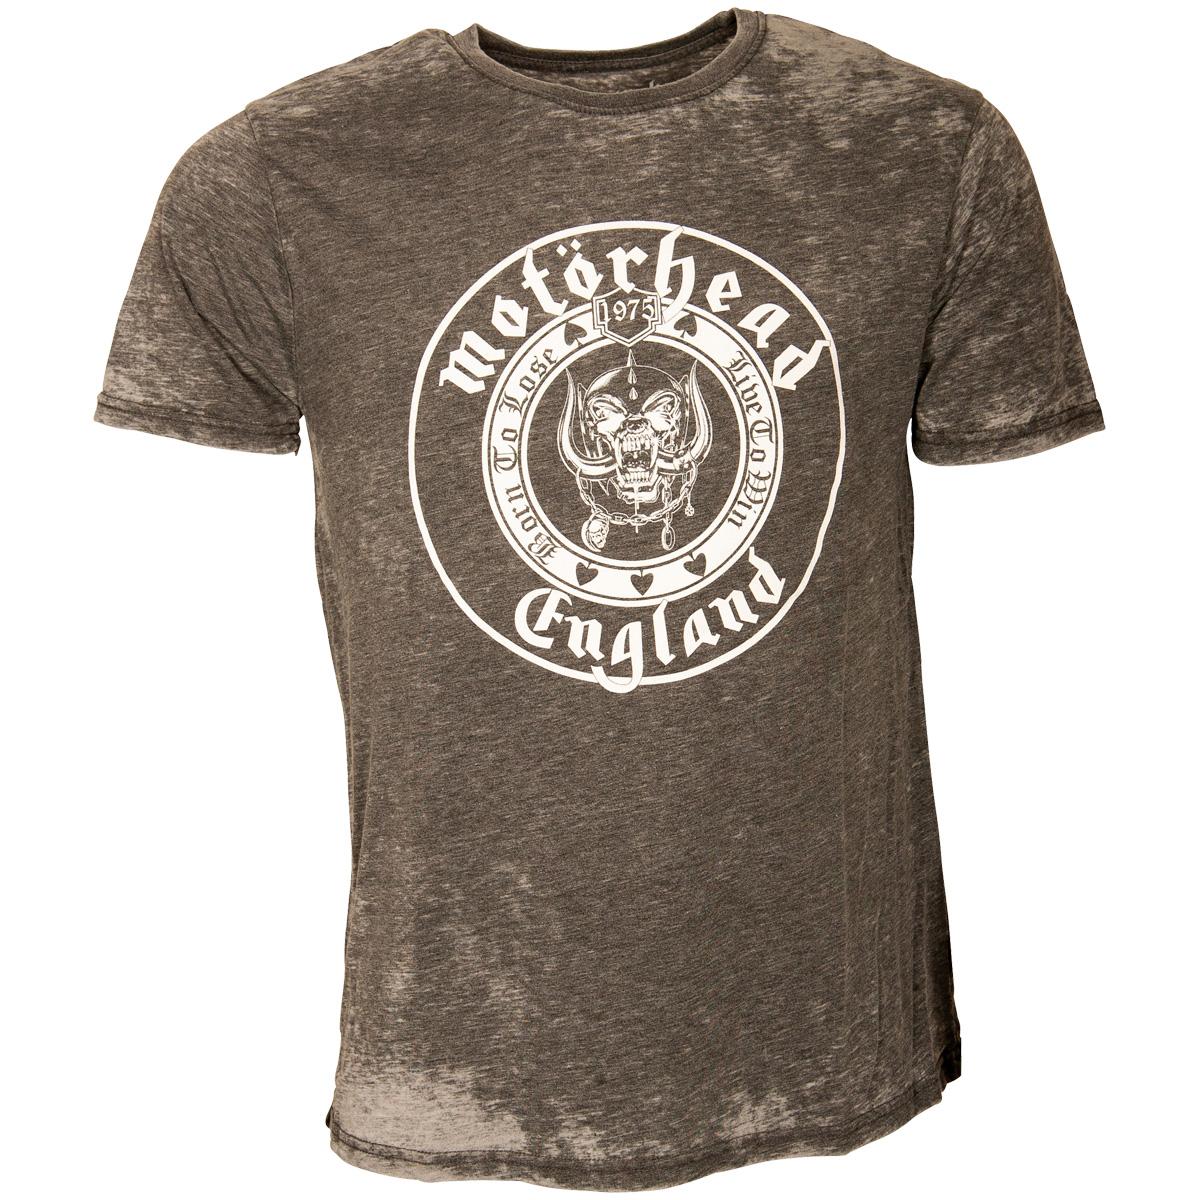 Motörhead - T-Shirt England Seal - grau-burnout